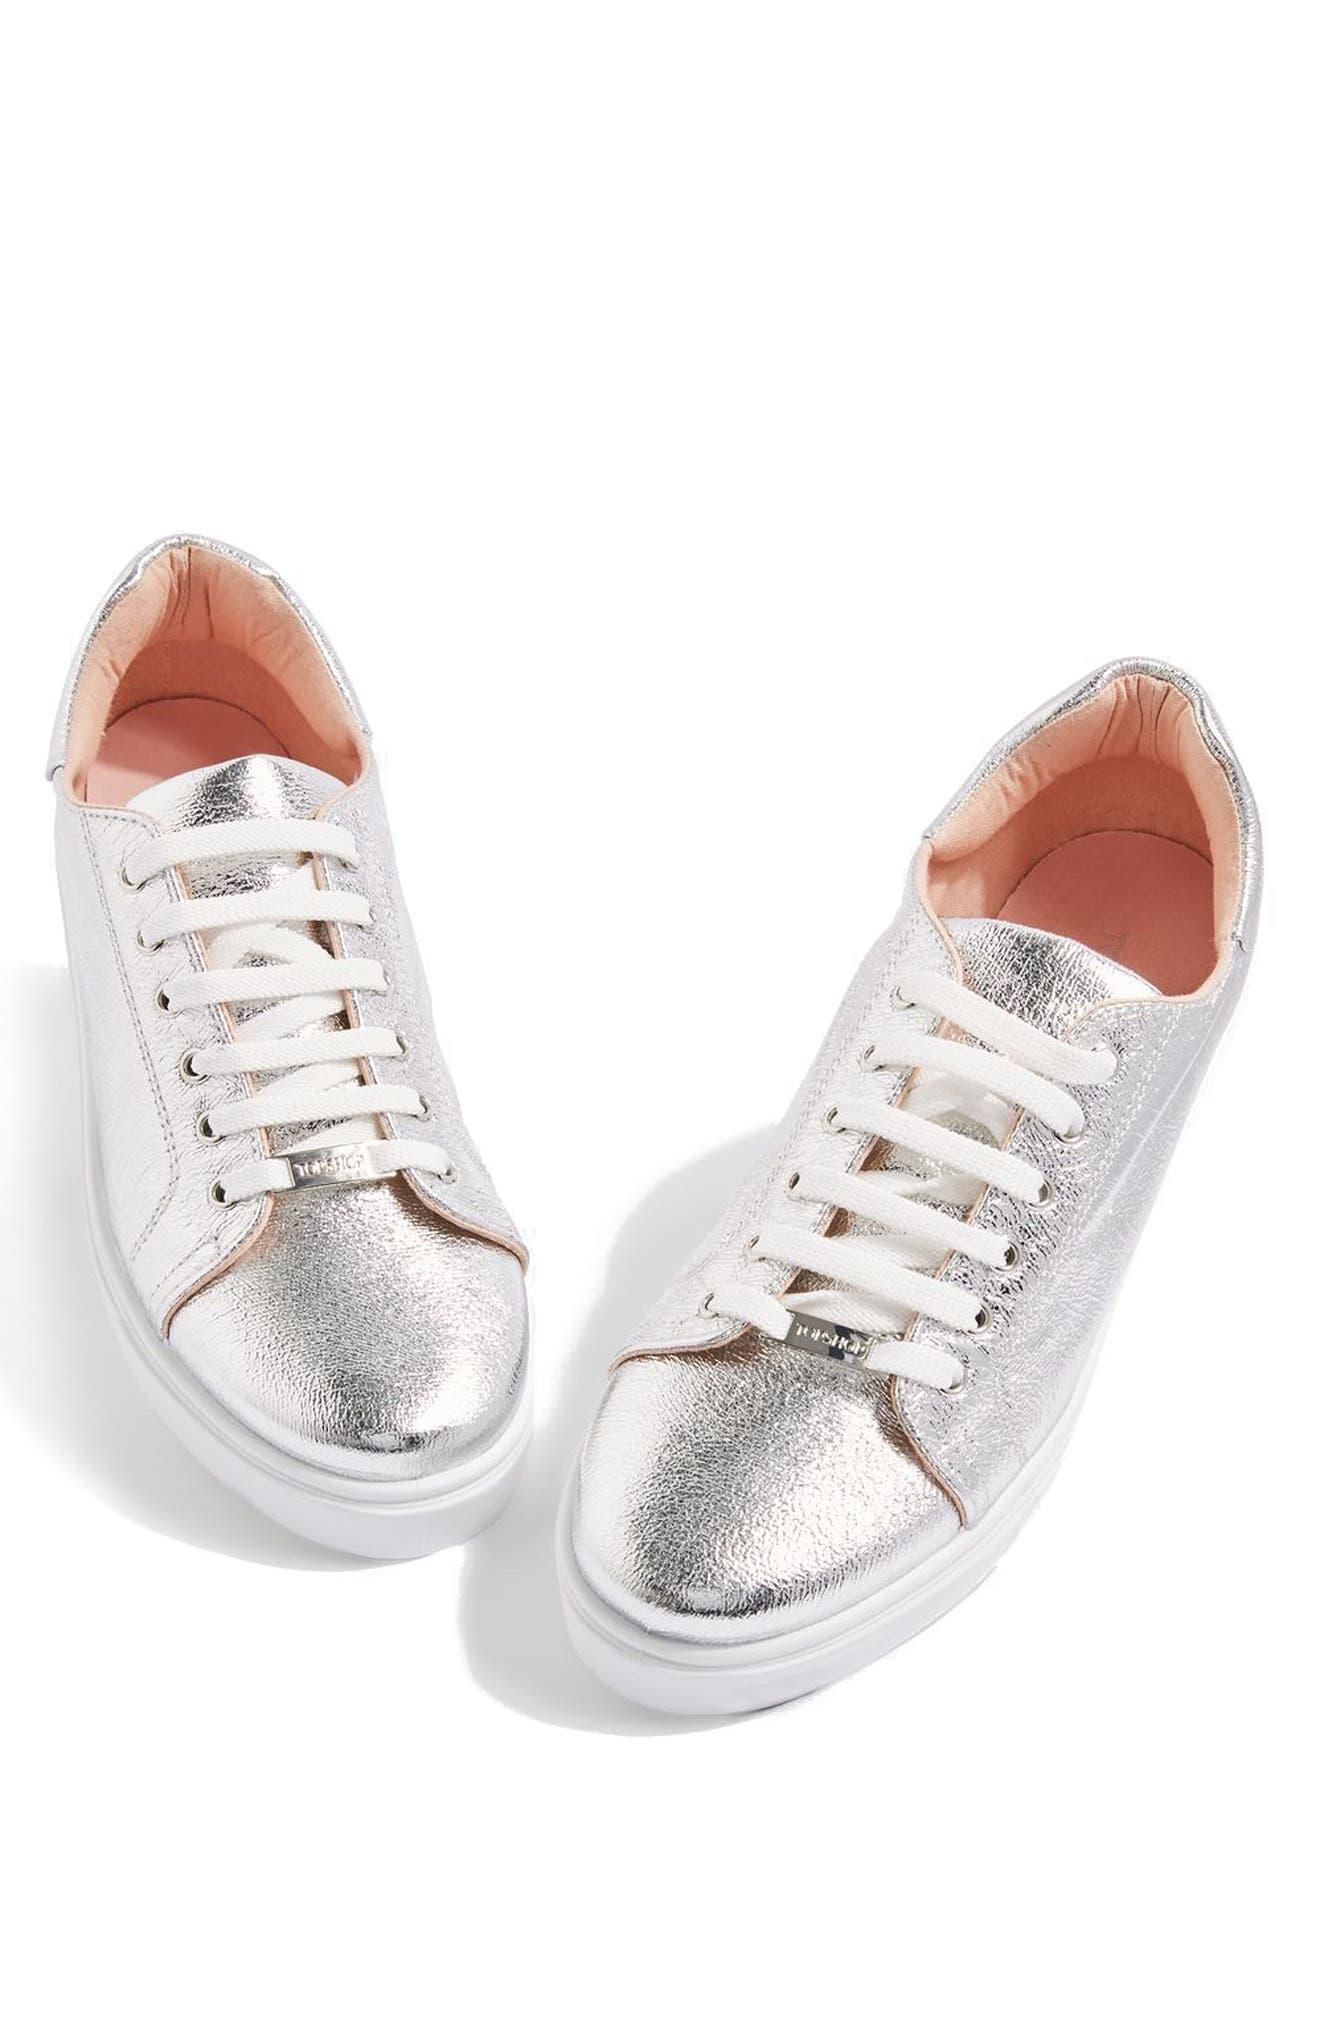 Main Image - Topshop Cosmo Metallic Lace-Up Sneaker (Women)